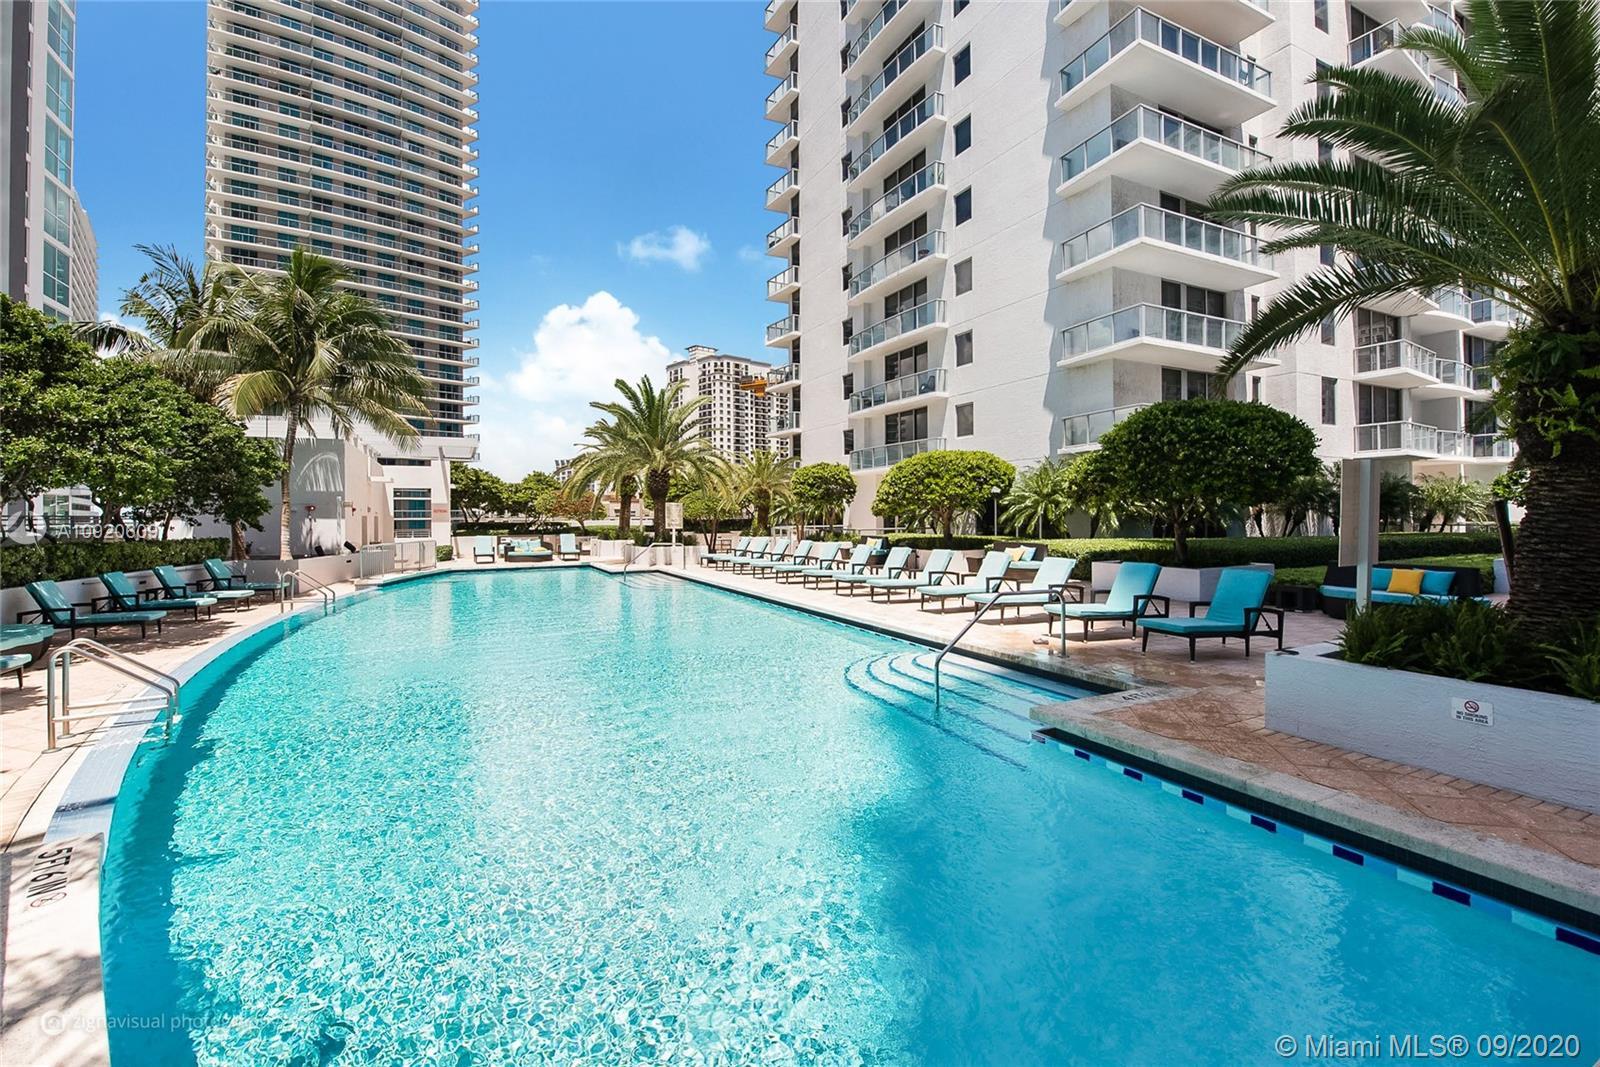 1060 Brickell East Tower #1002 - 1050 Brickell Ave #1002, Miami, FL 33131